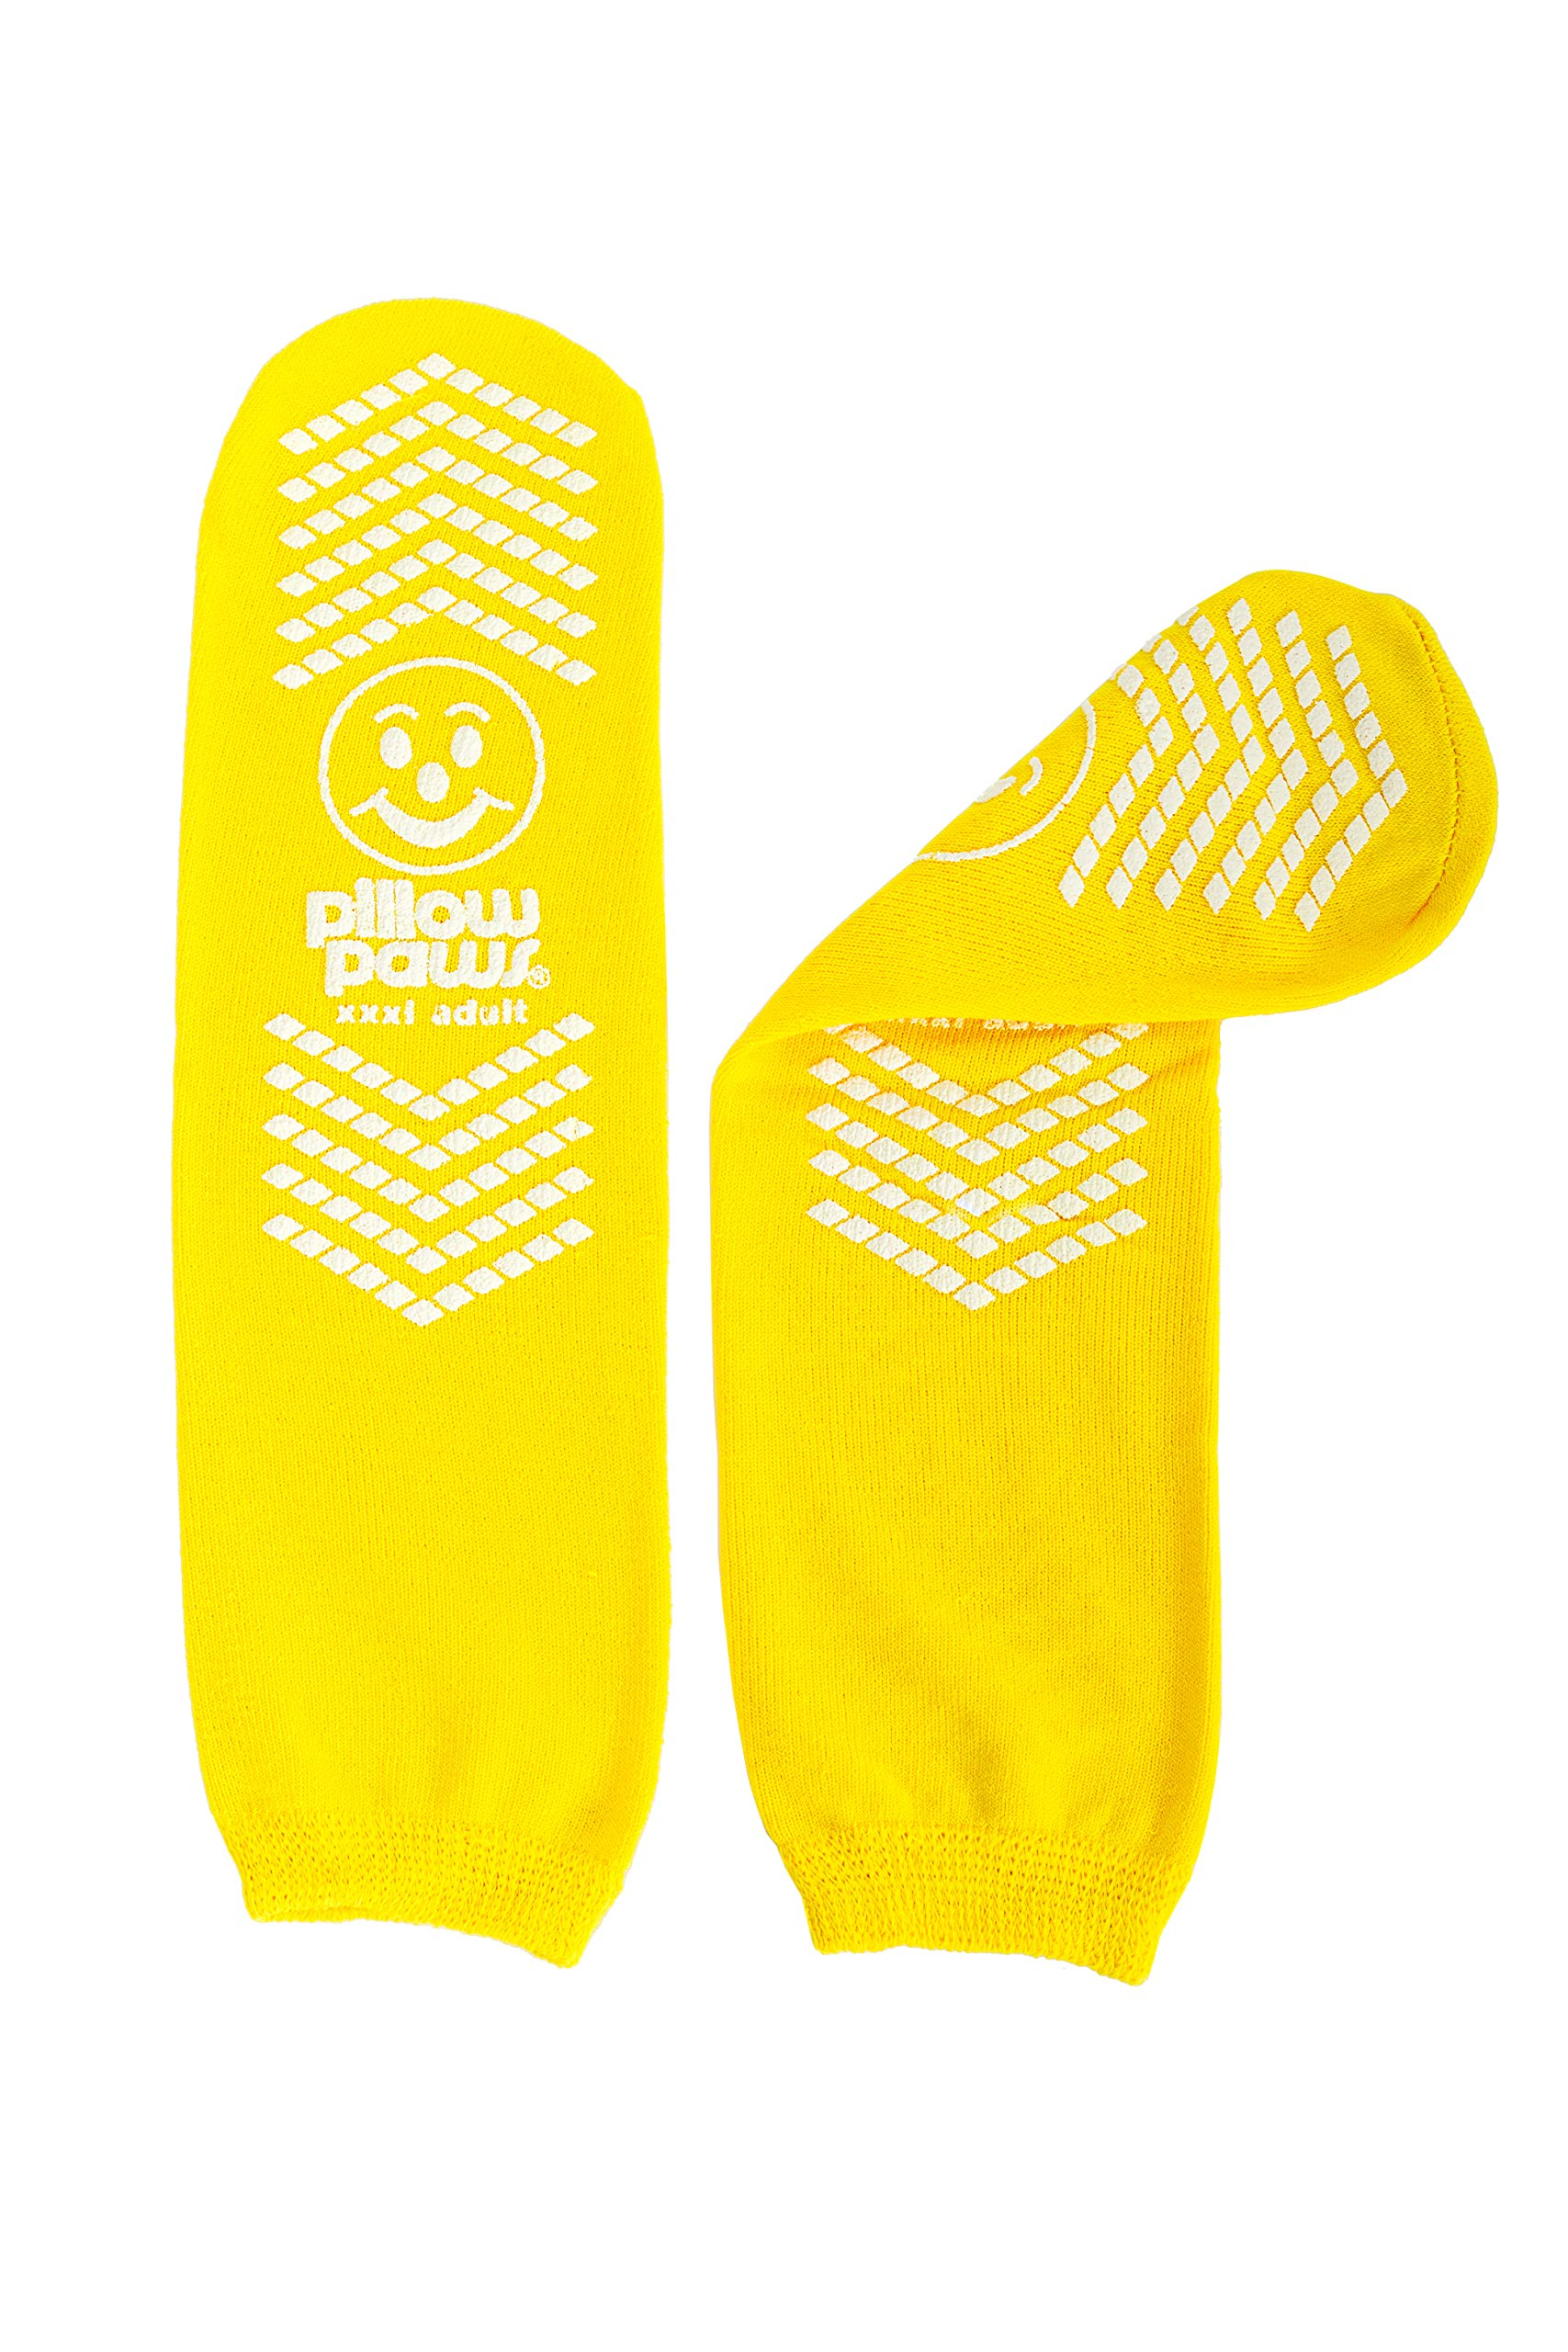 XXXL Slip Stopping Terrycloth Socks (Double Tread) (Extra Wide Bariatric) (Yellow) (3 Pairs)